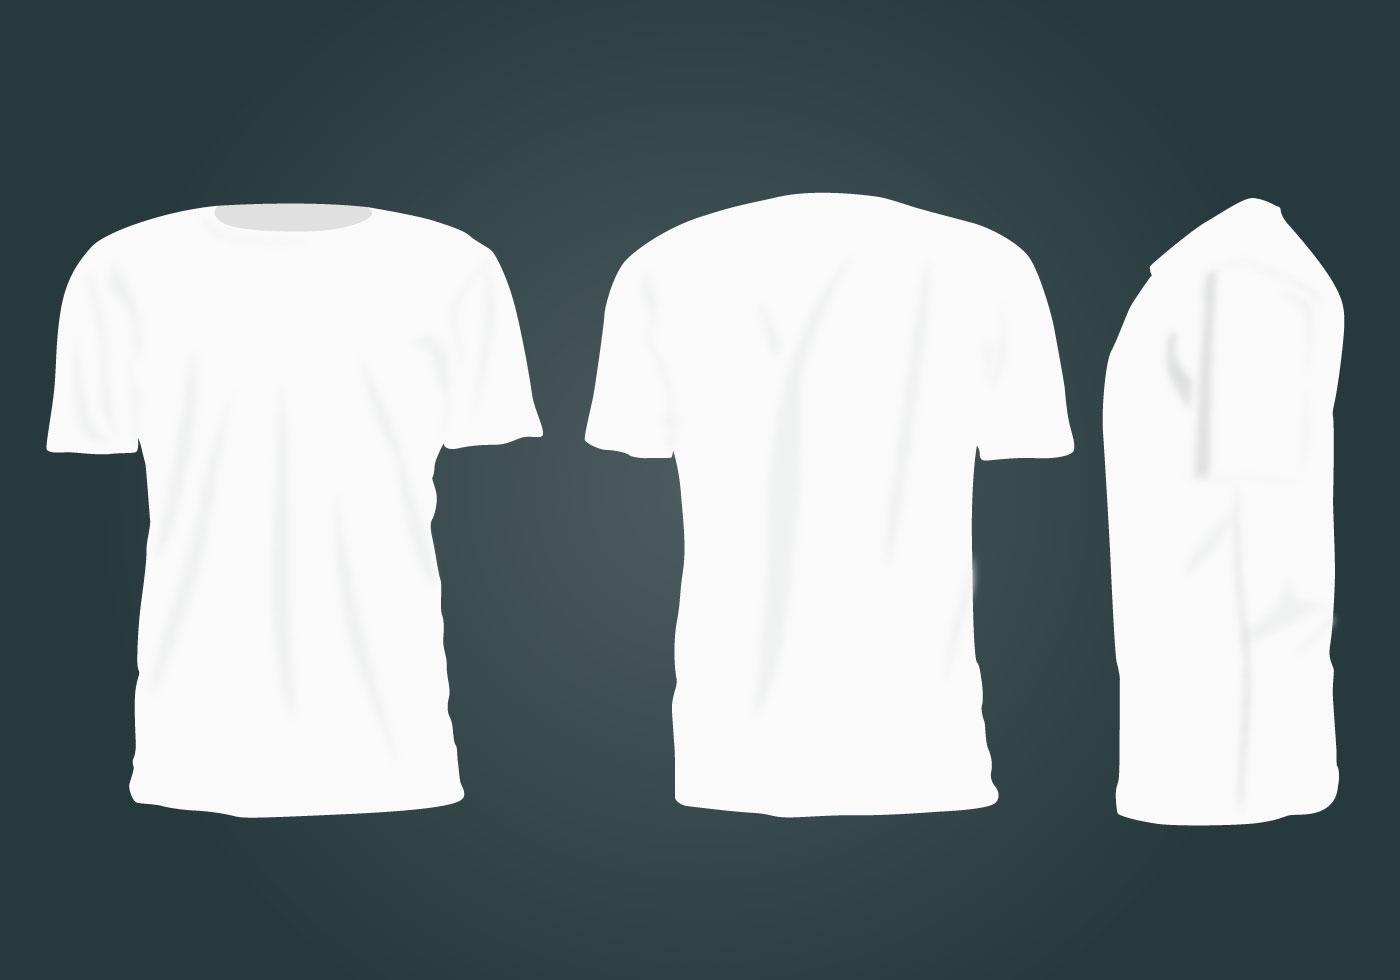 blank tshirt template vector download free vector art